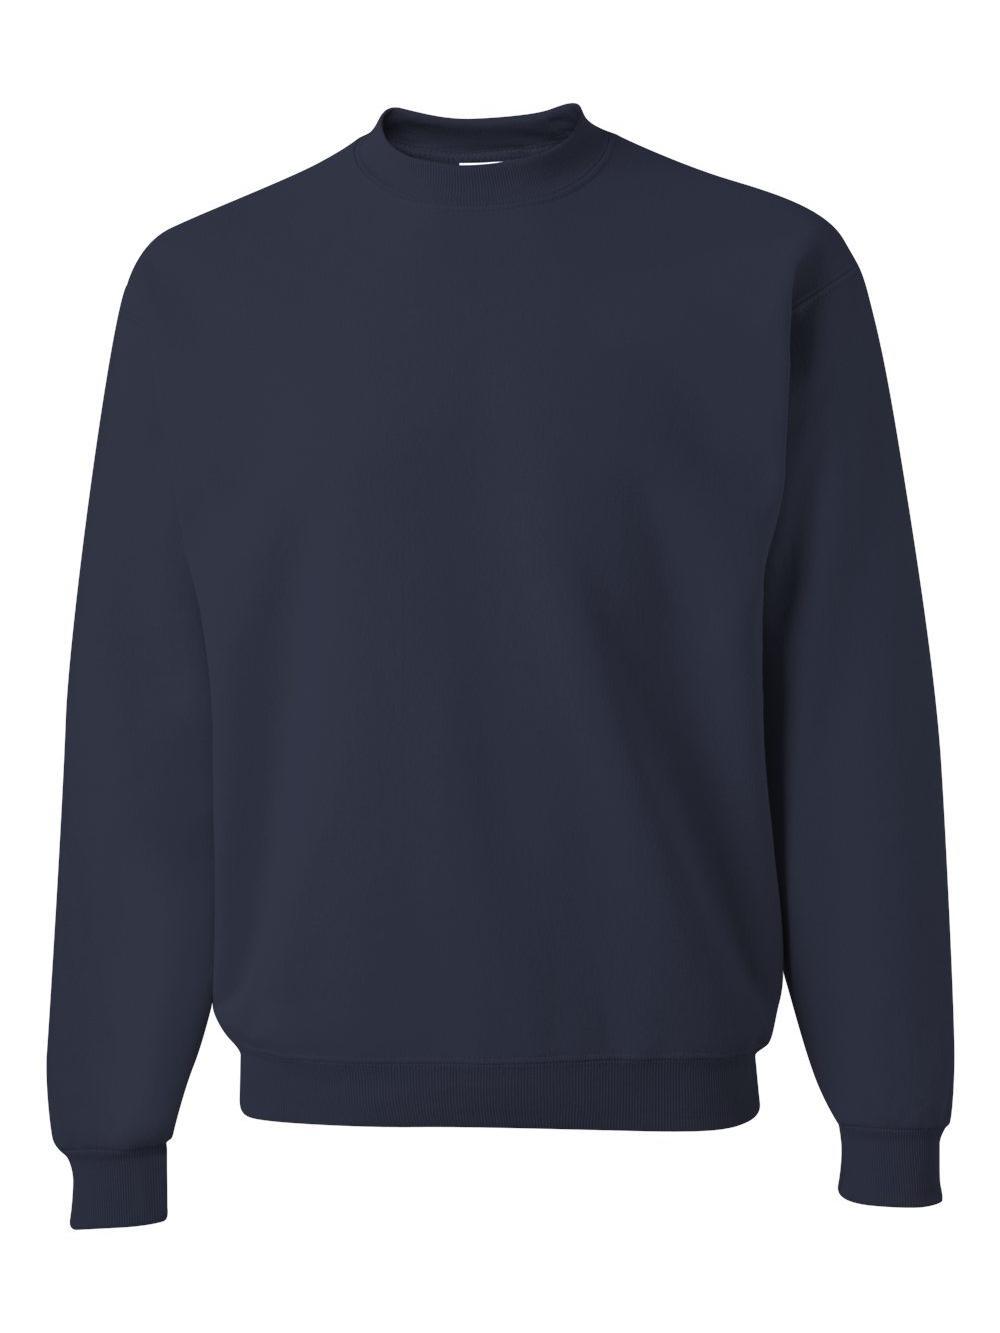 Jerzees-NuBlend-Crewneck-Sweatshirt-562MR thumbnail 45